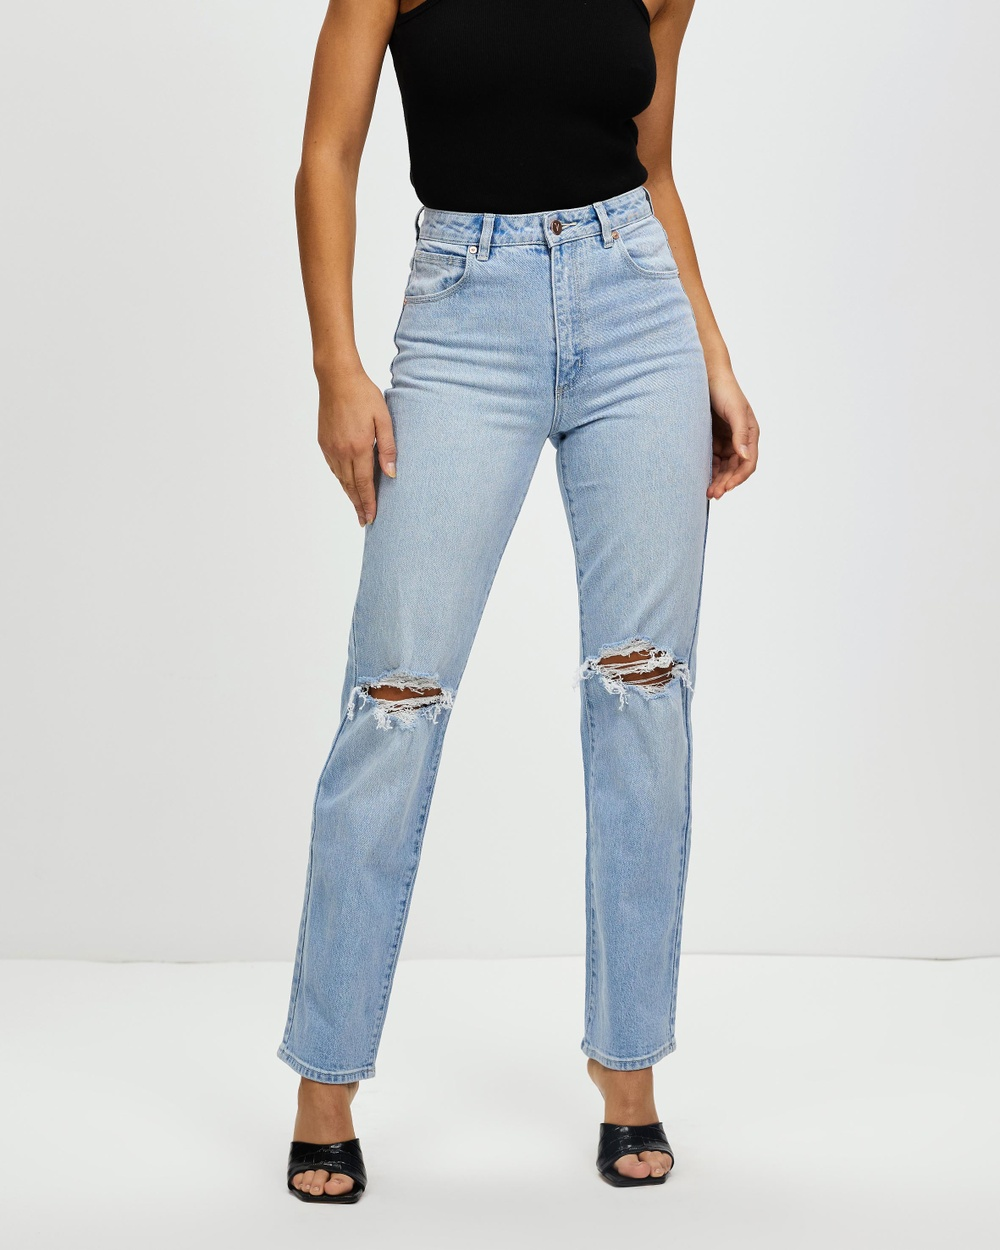 Abrand A '94 High Straight Jeans High-Waisted Gina Rip